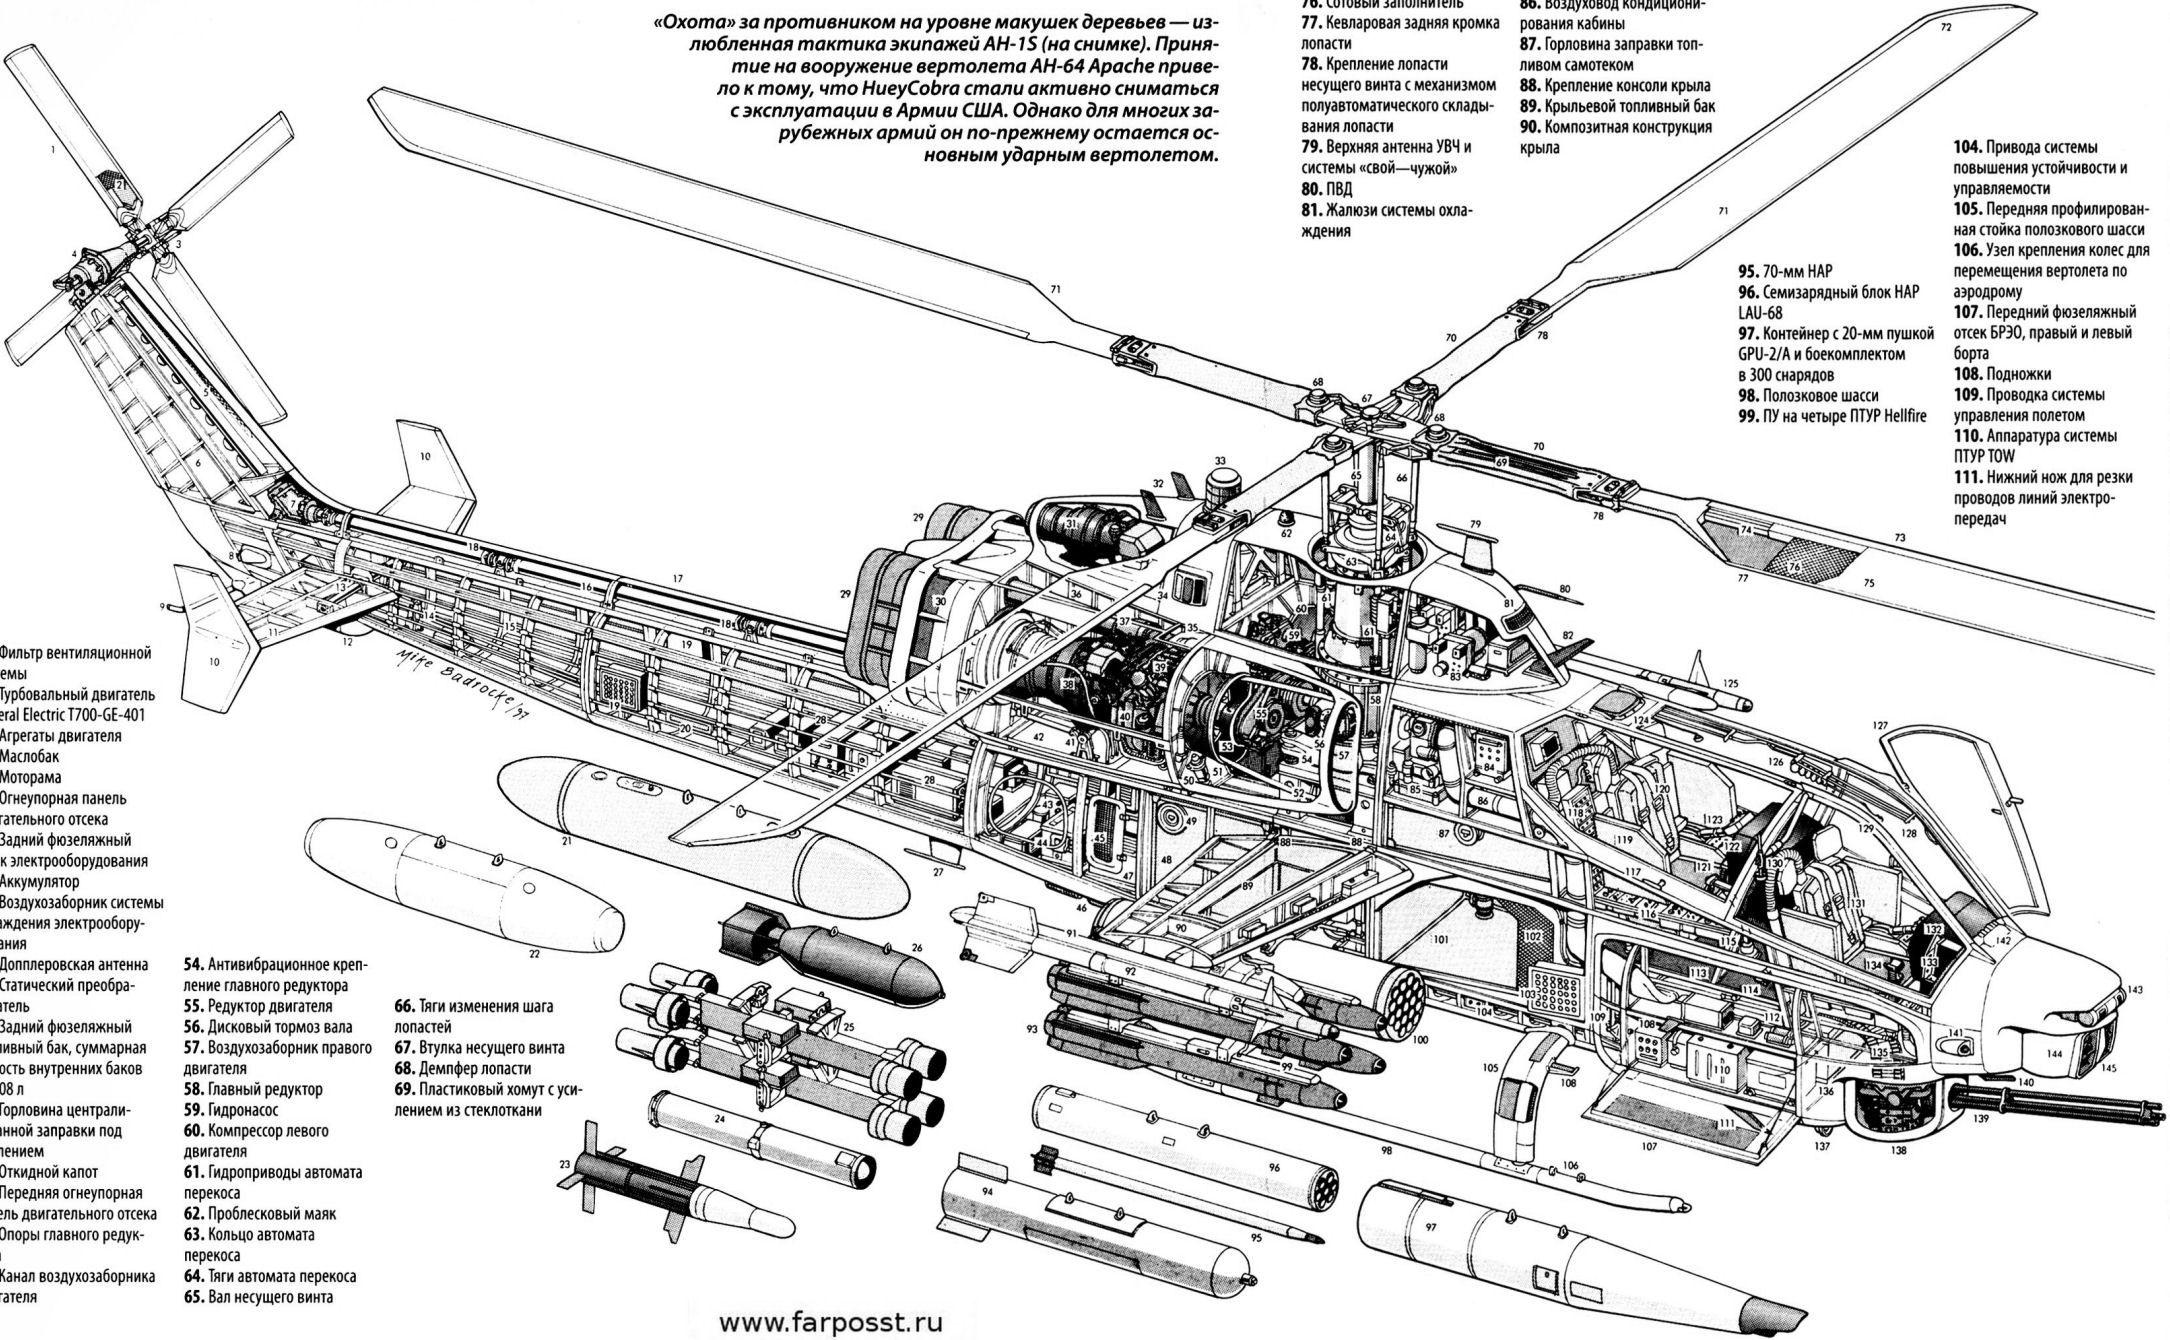 medium resolution of ah 1w cutaway attack helicopter military helicopter military aircraft military weapons